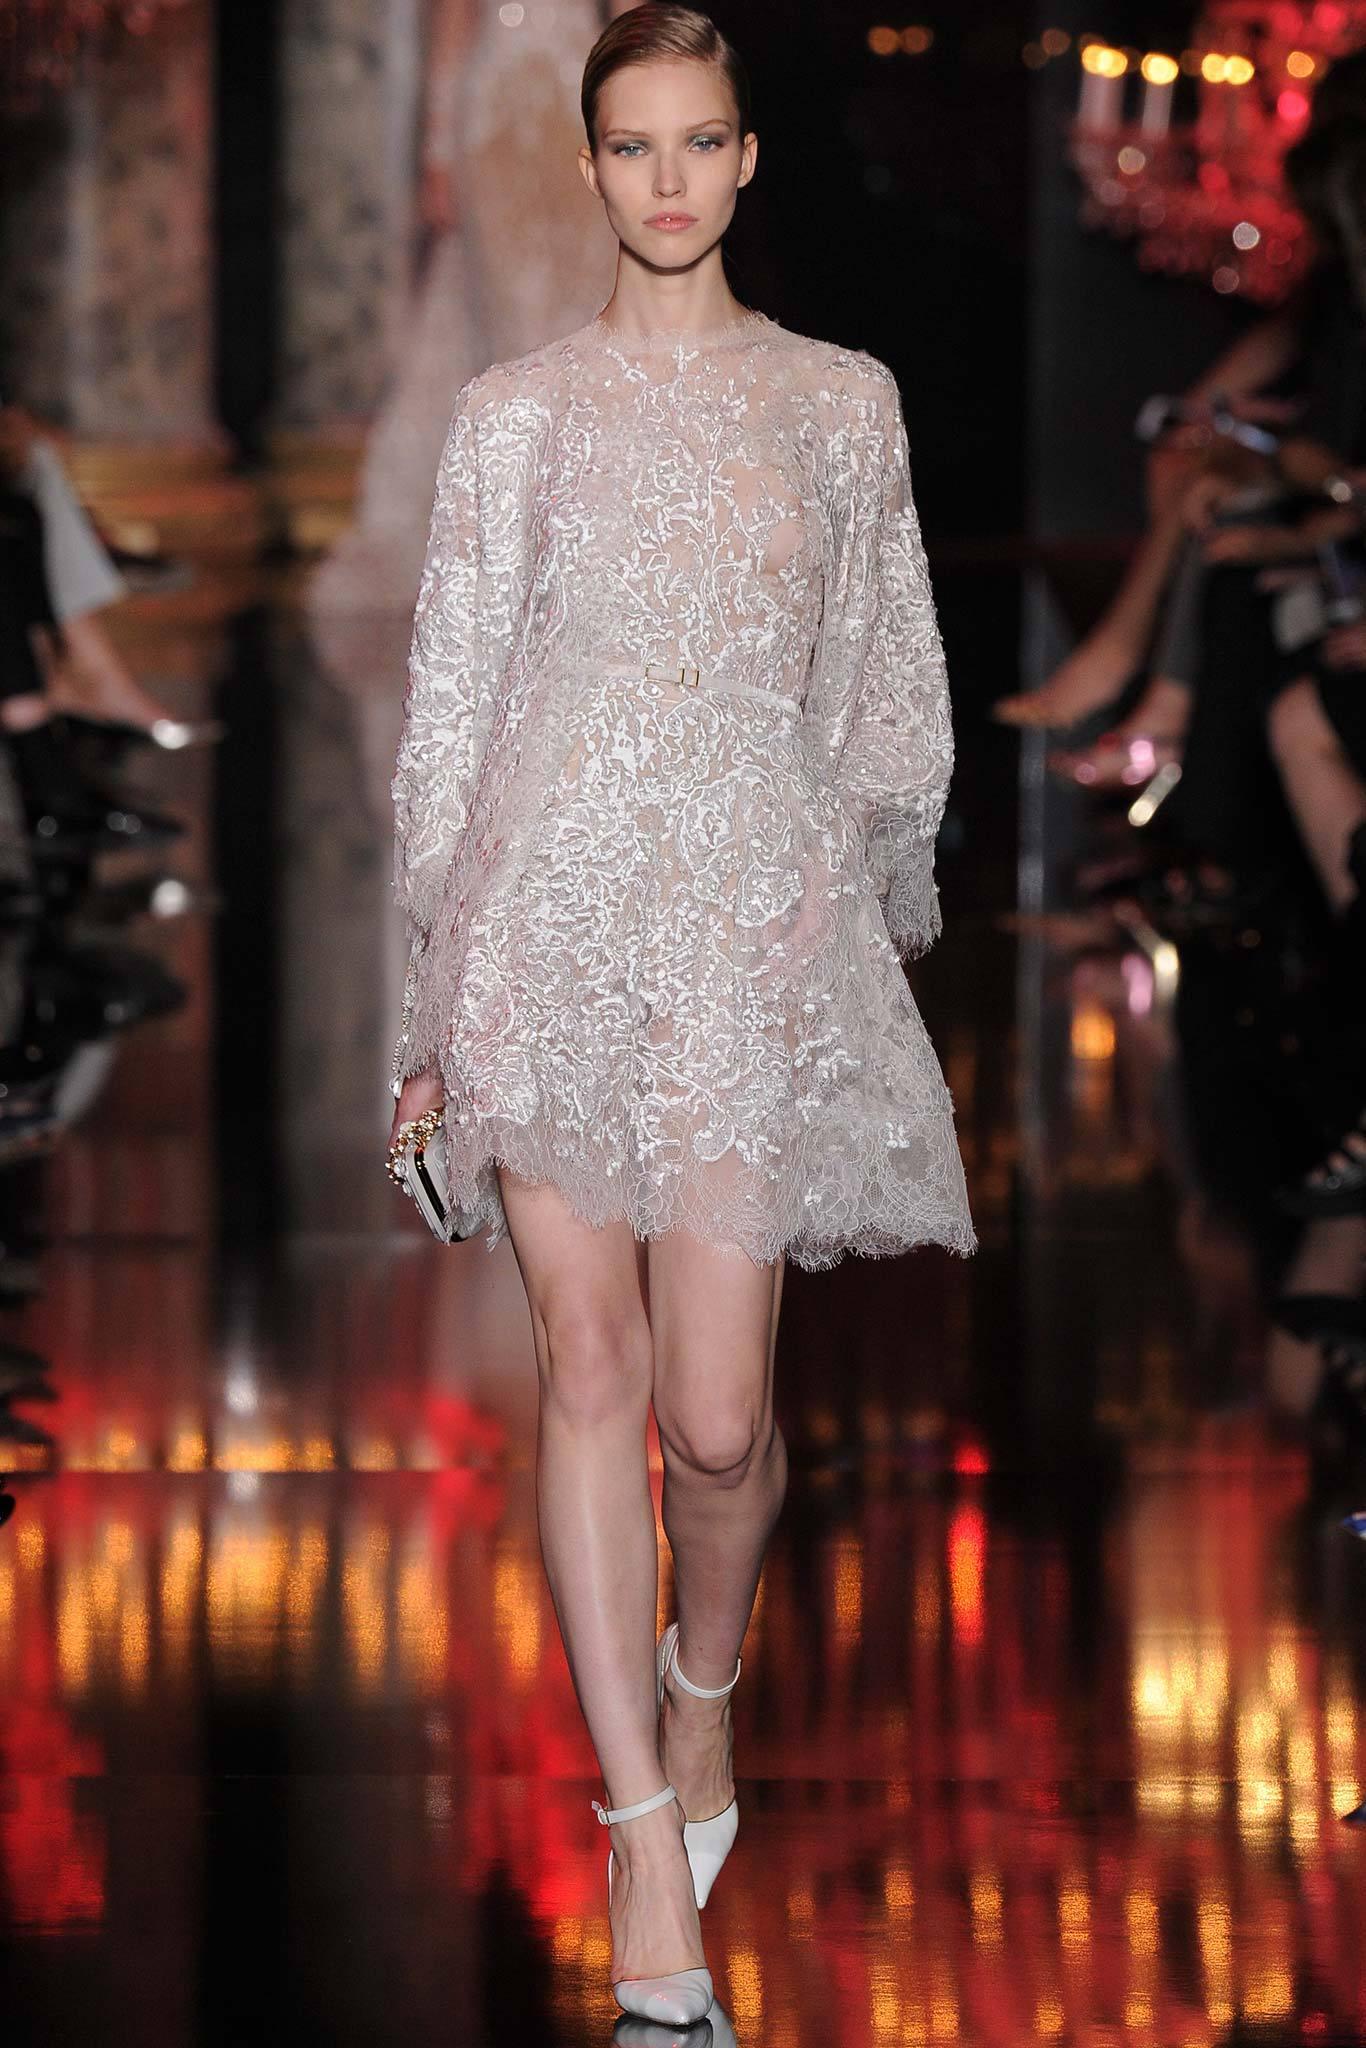 Elie-Saab-Couture-Fall2014-14.JPG